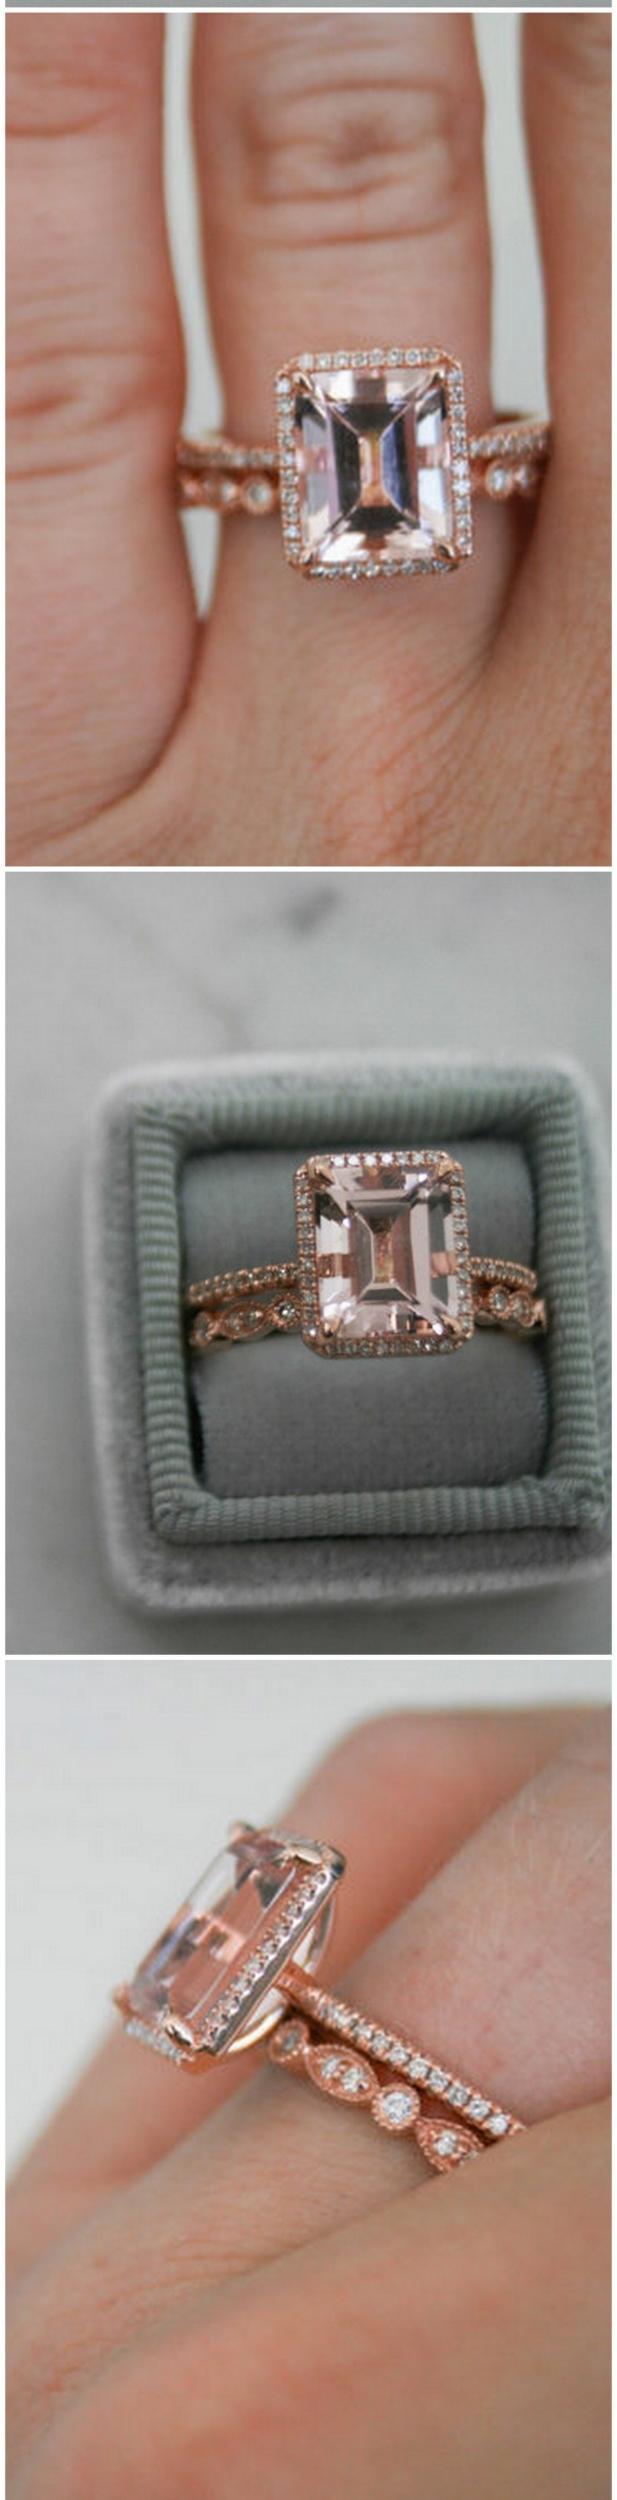 Emerald Morganite Ring,Halo Diamond Rose Gold Morganite Engagement Ring, Rose Gold Morganite Ring, Engagement Ring, Morganite